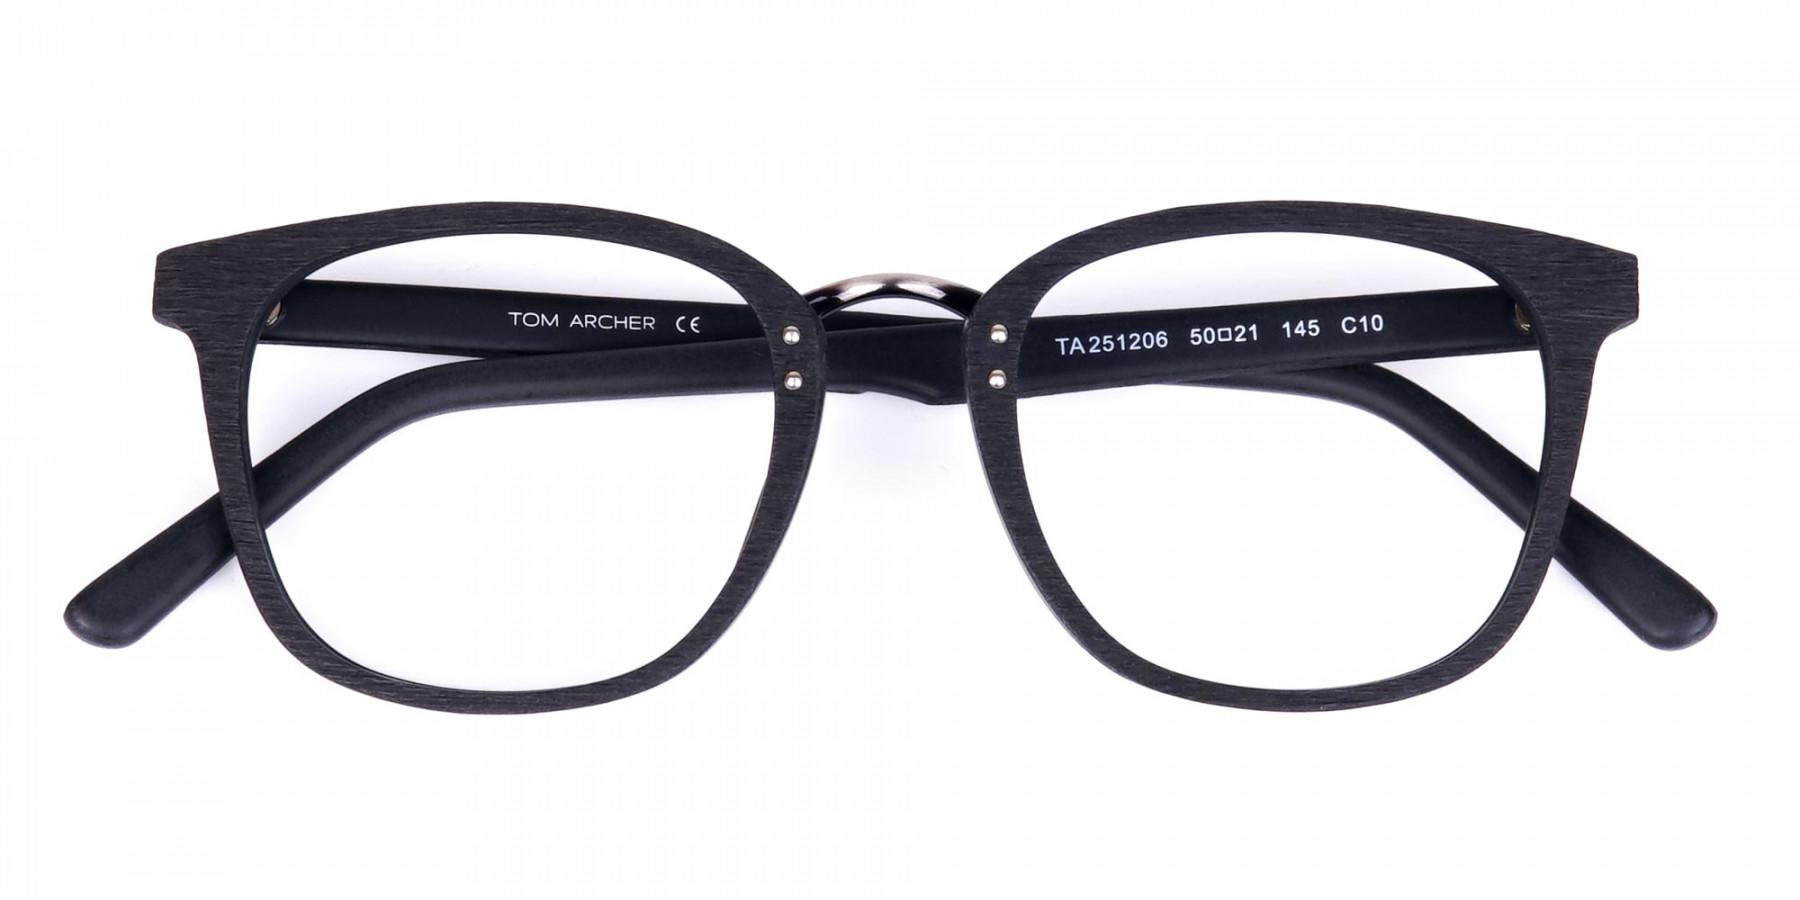 Texture-Black-Square-Wood-Rim-Glasses-1